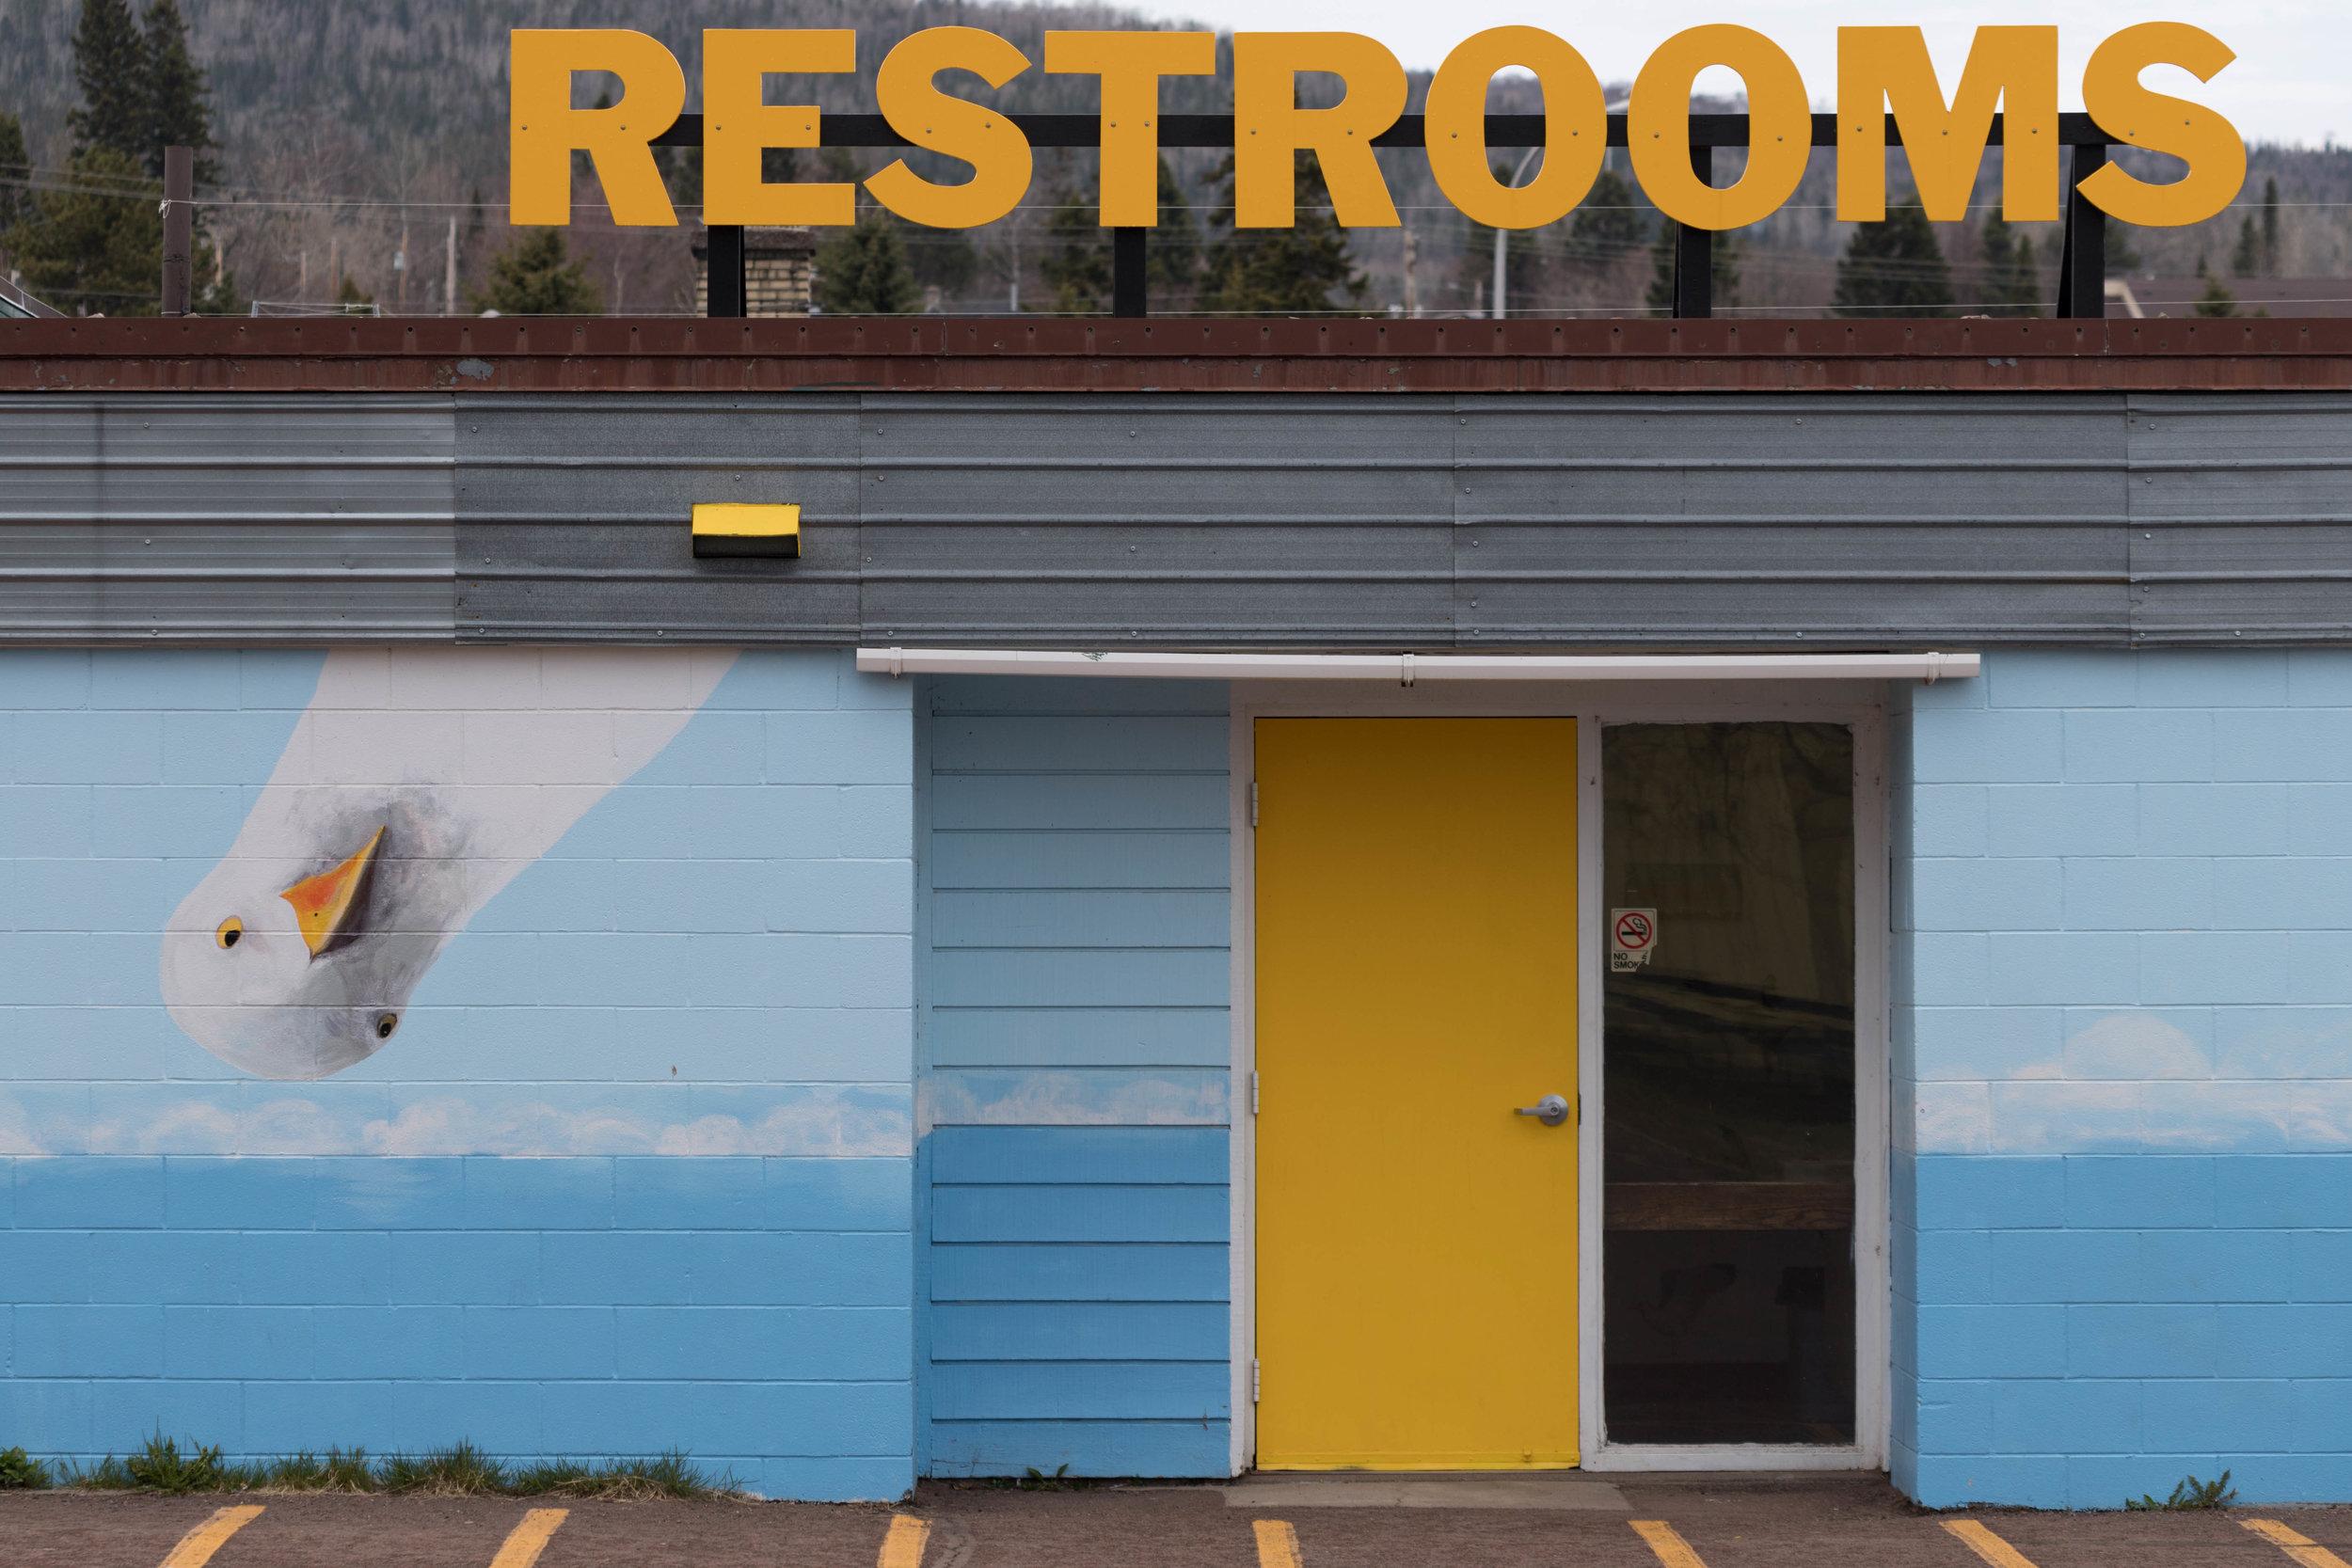 may 19, 2018  restrooms - grand marais, minnesota